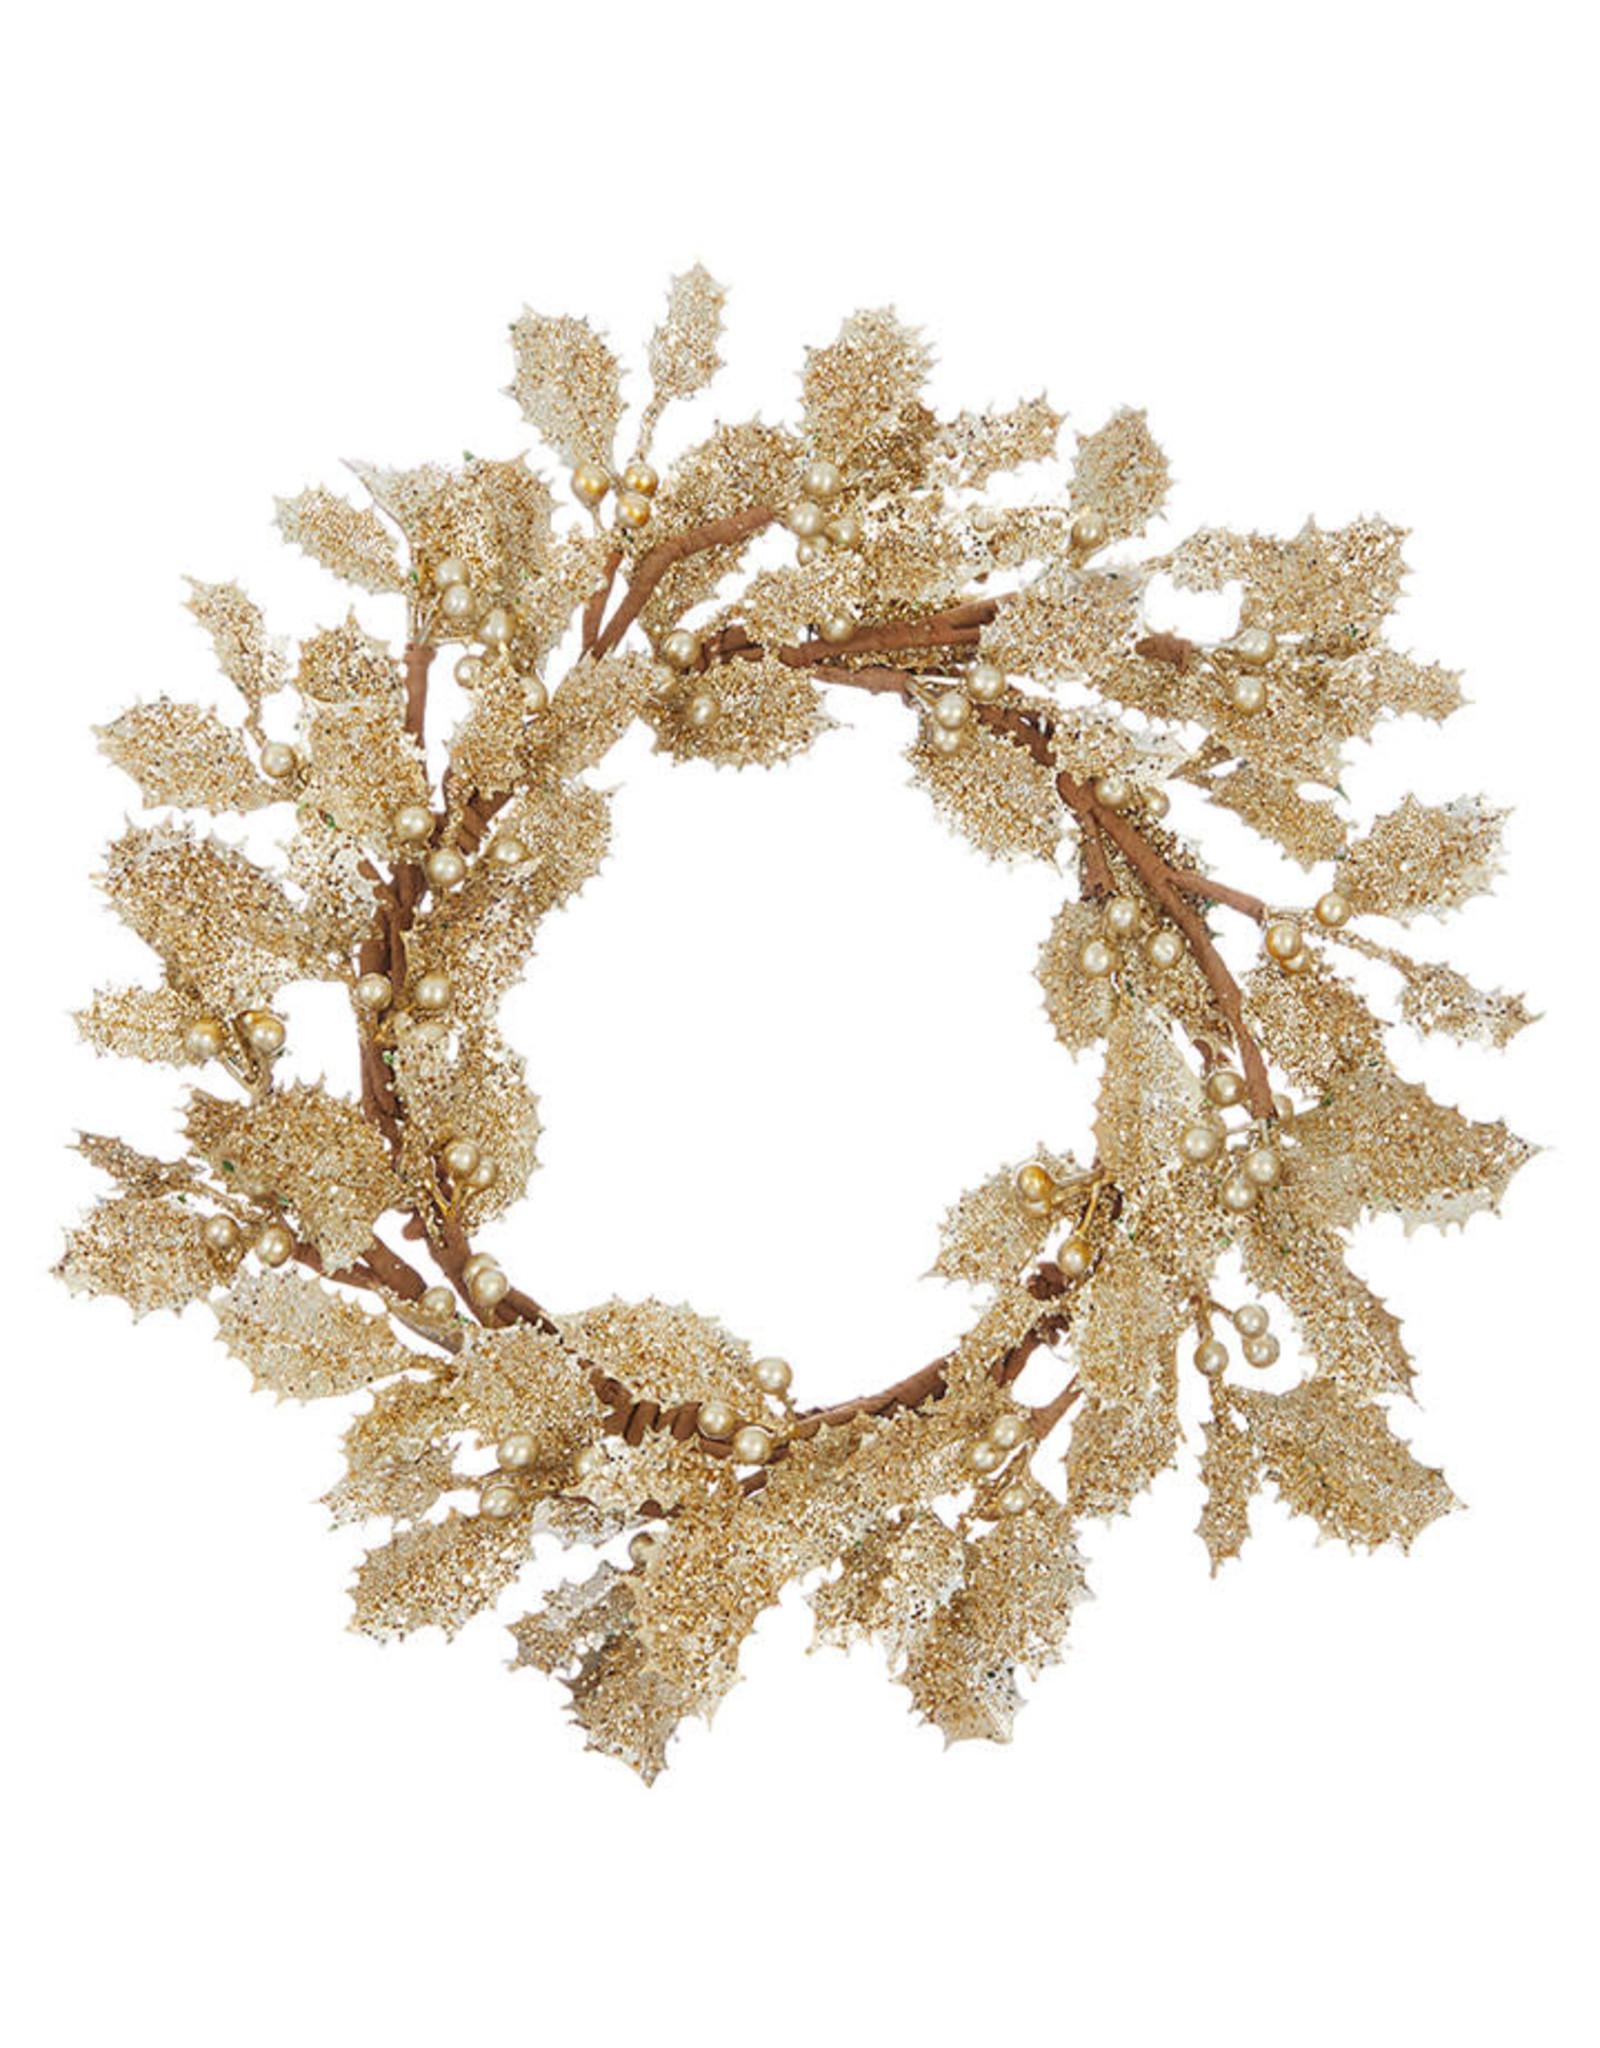 Raz Imports GOLD HOLLY CANDLE RING